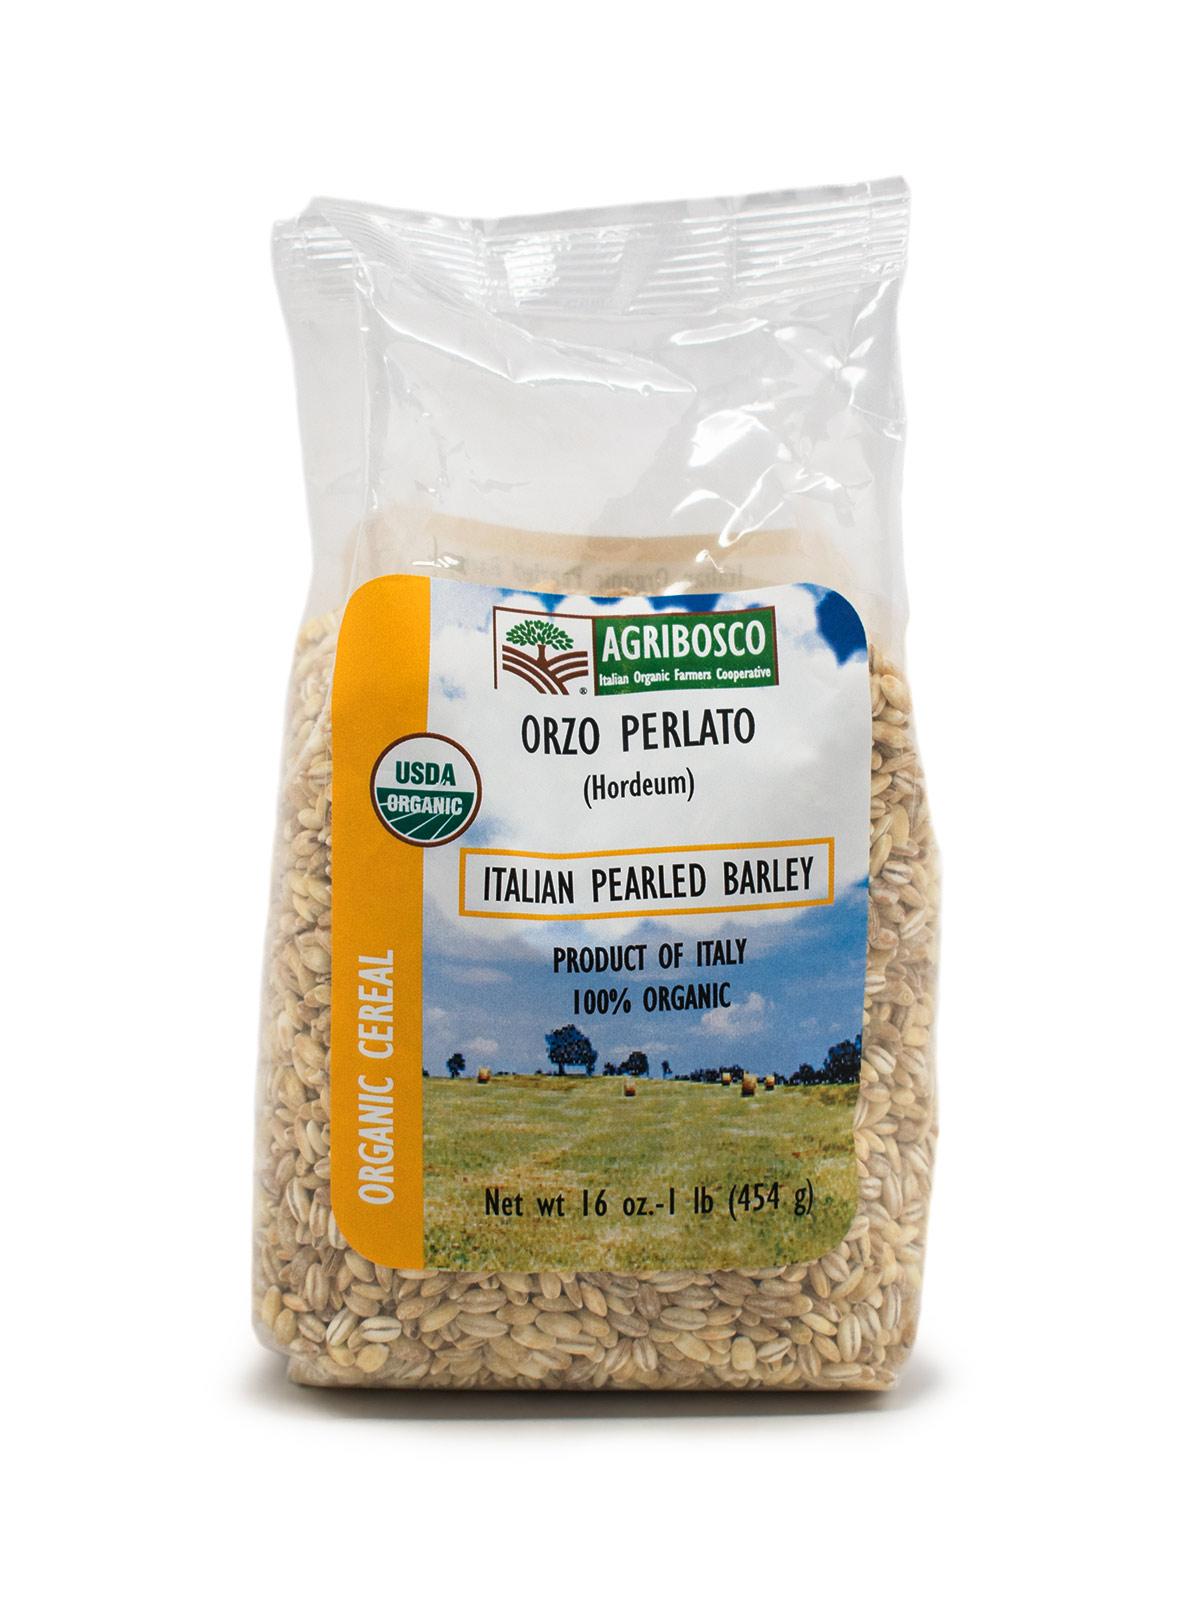 Organic Italian Pearled Barley - Pastas, Rice, and Grains - Buon'Italia